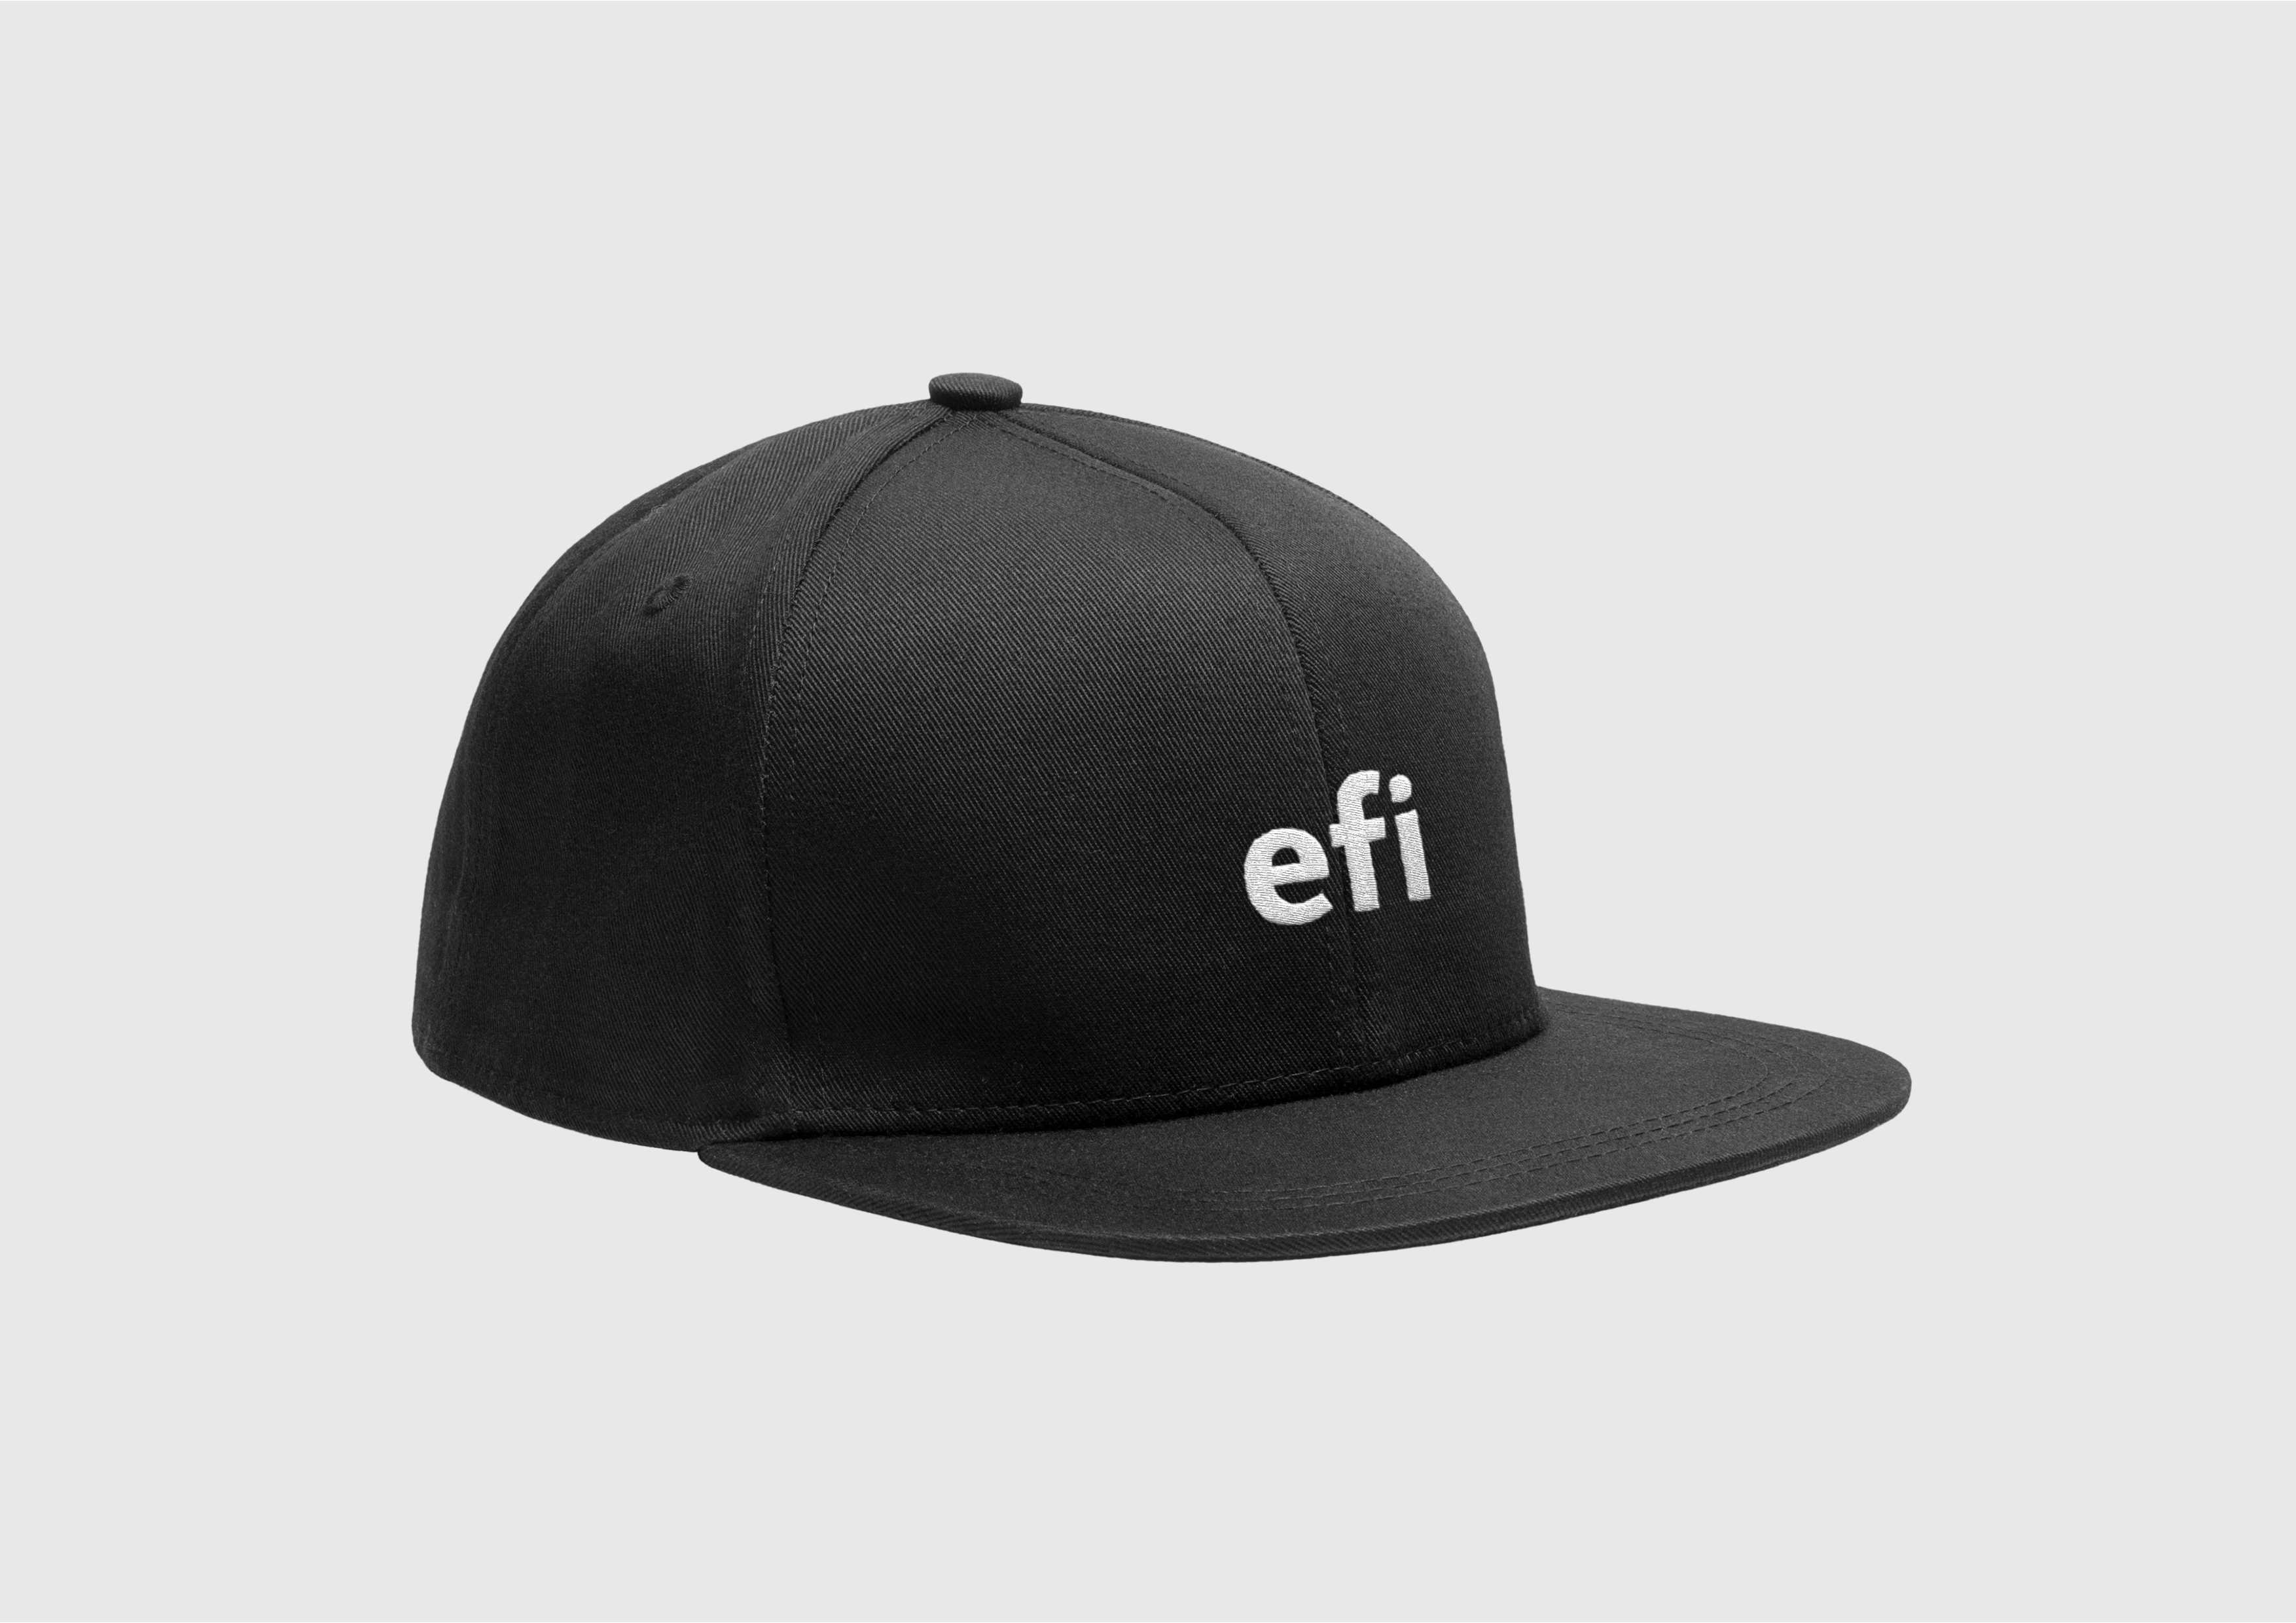 Hat with EFI logo icon